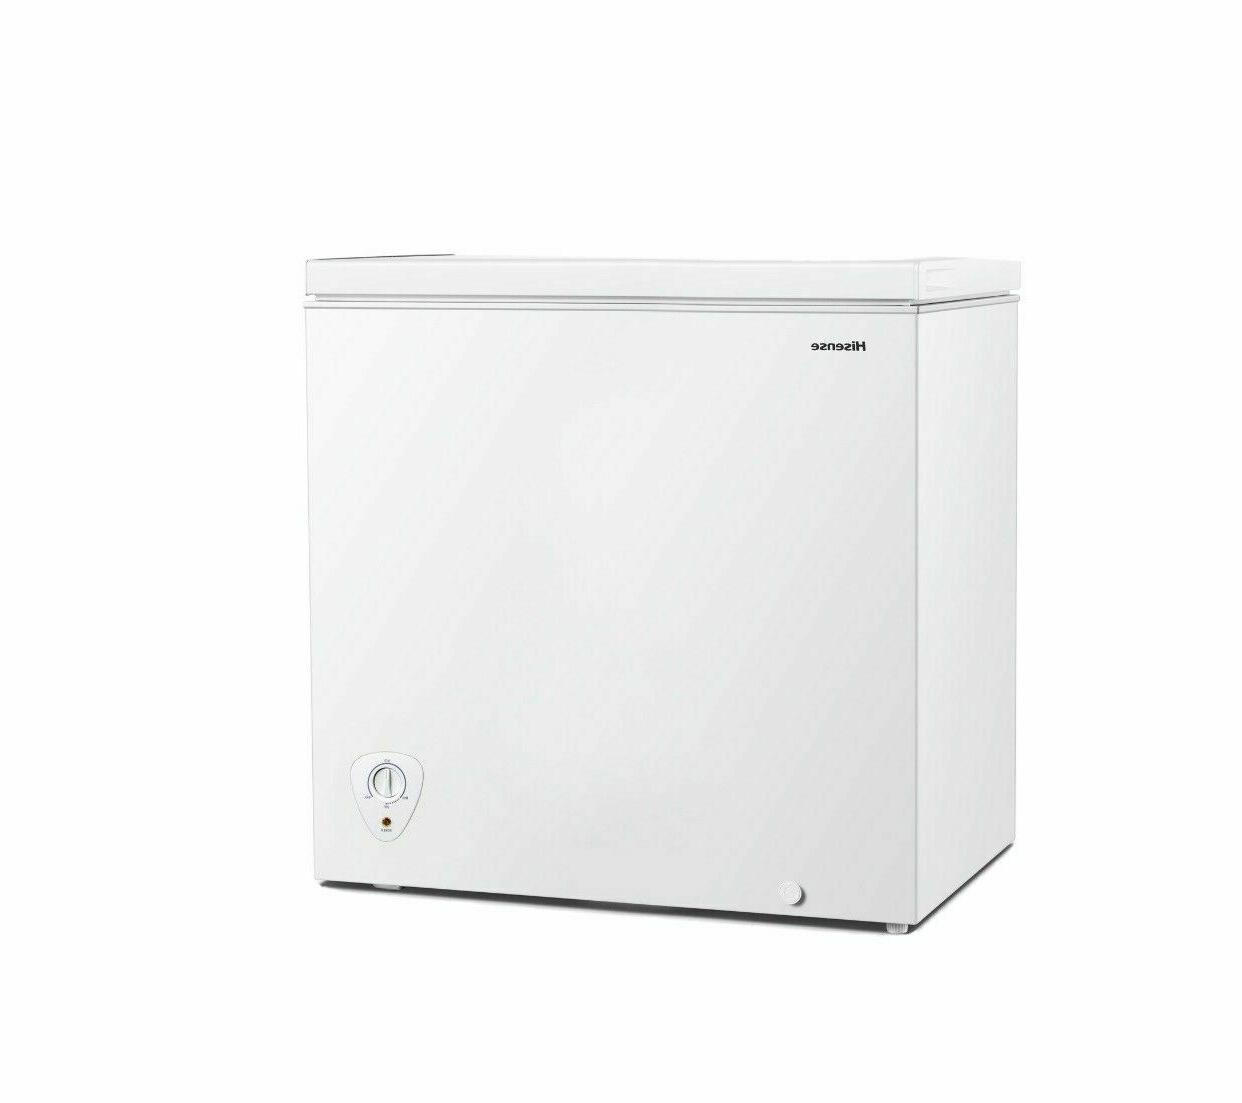 Hisense Chest Freezer - Free